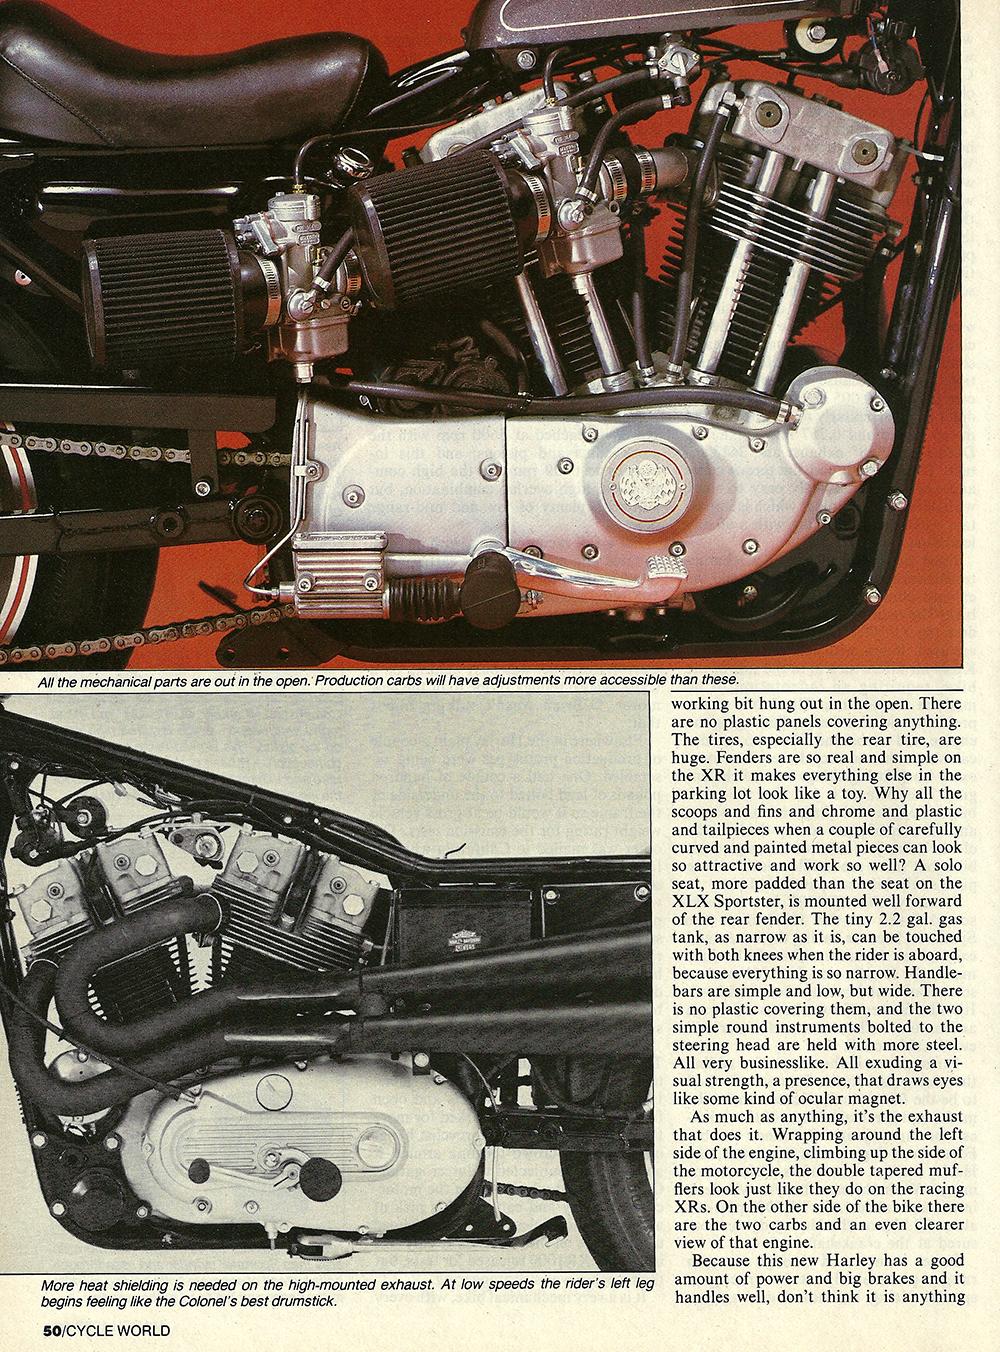 1983 Harley-Davidson XR1000 road test 05.jpg